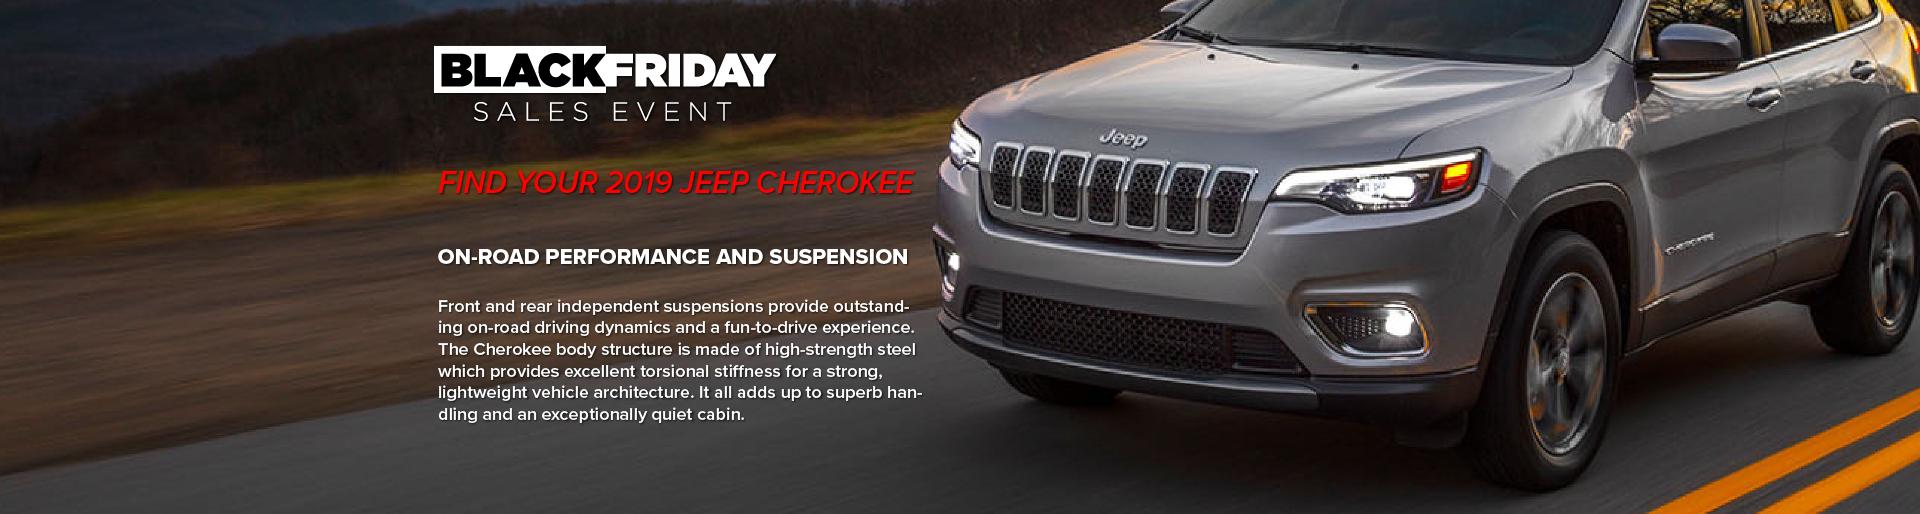 Tanner Motors Cherokee Black Friday Sales Event